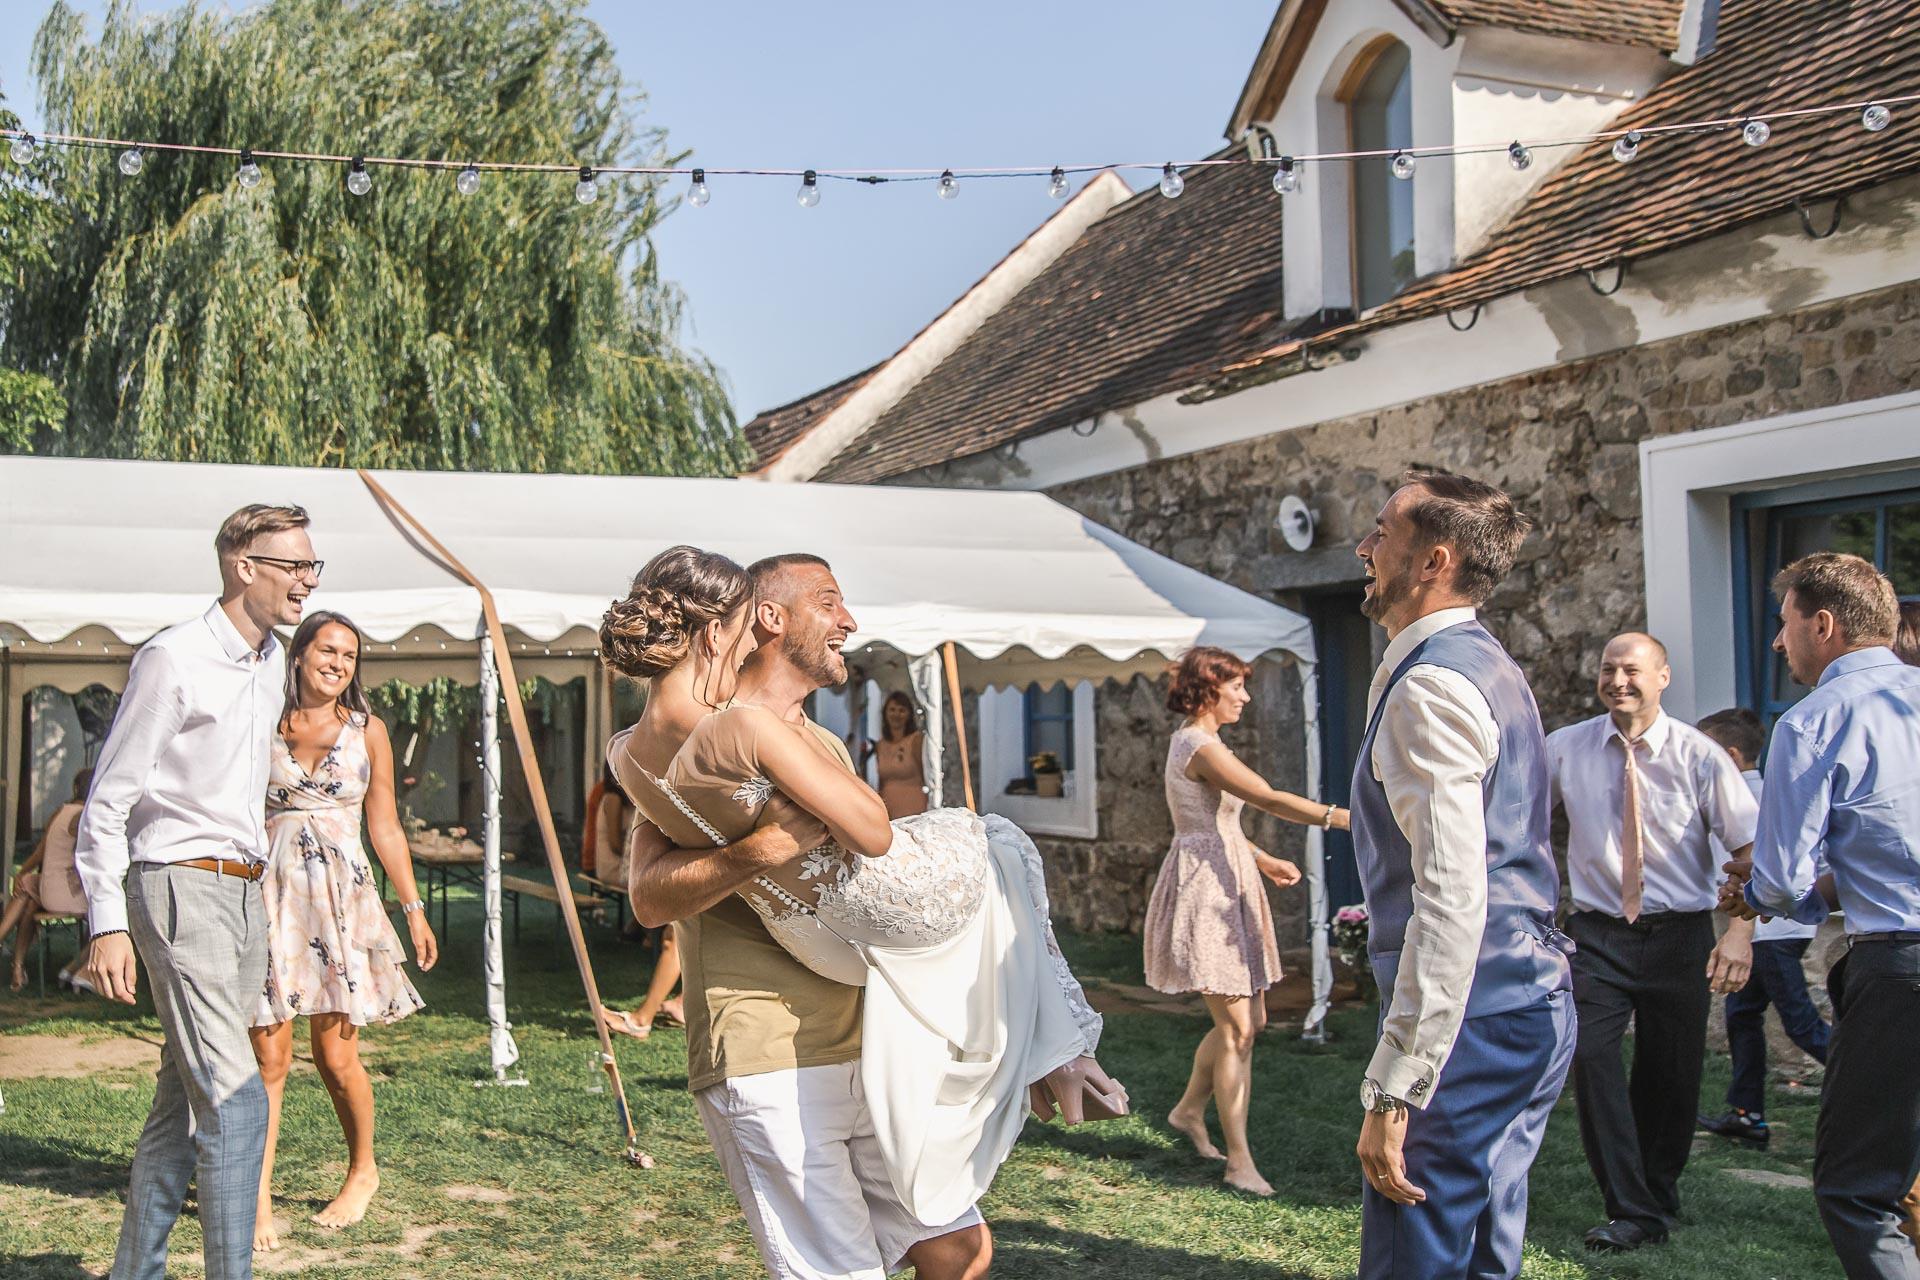 svatební-fotograf-wedding-svatebni-video-orlík-vltava-kostel-statek-stodola-boho-svatba-Beautyfoto-455